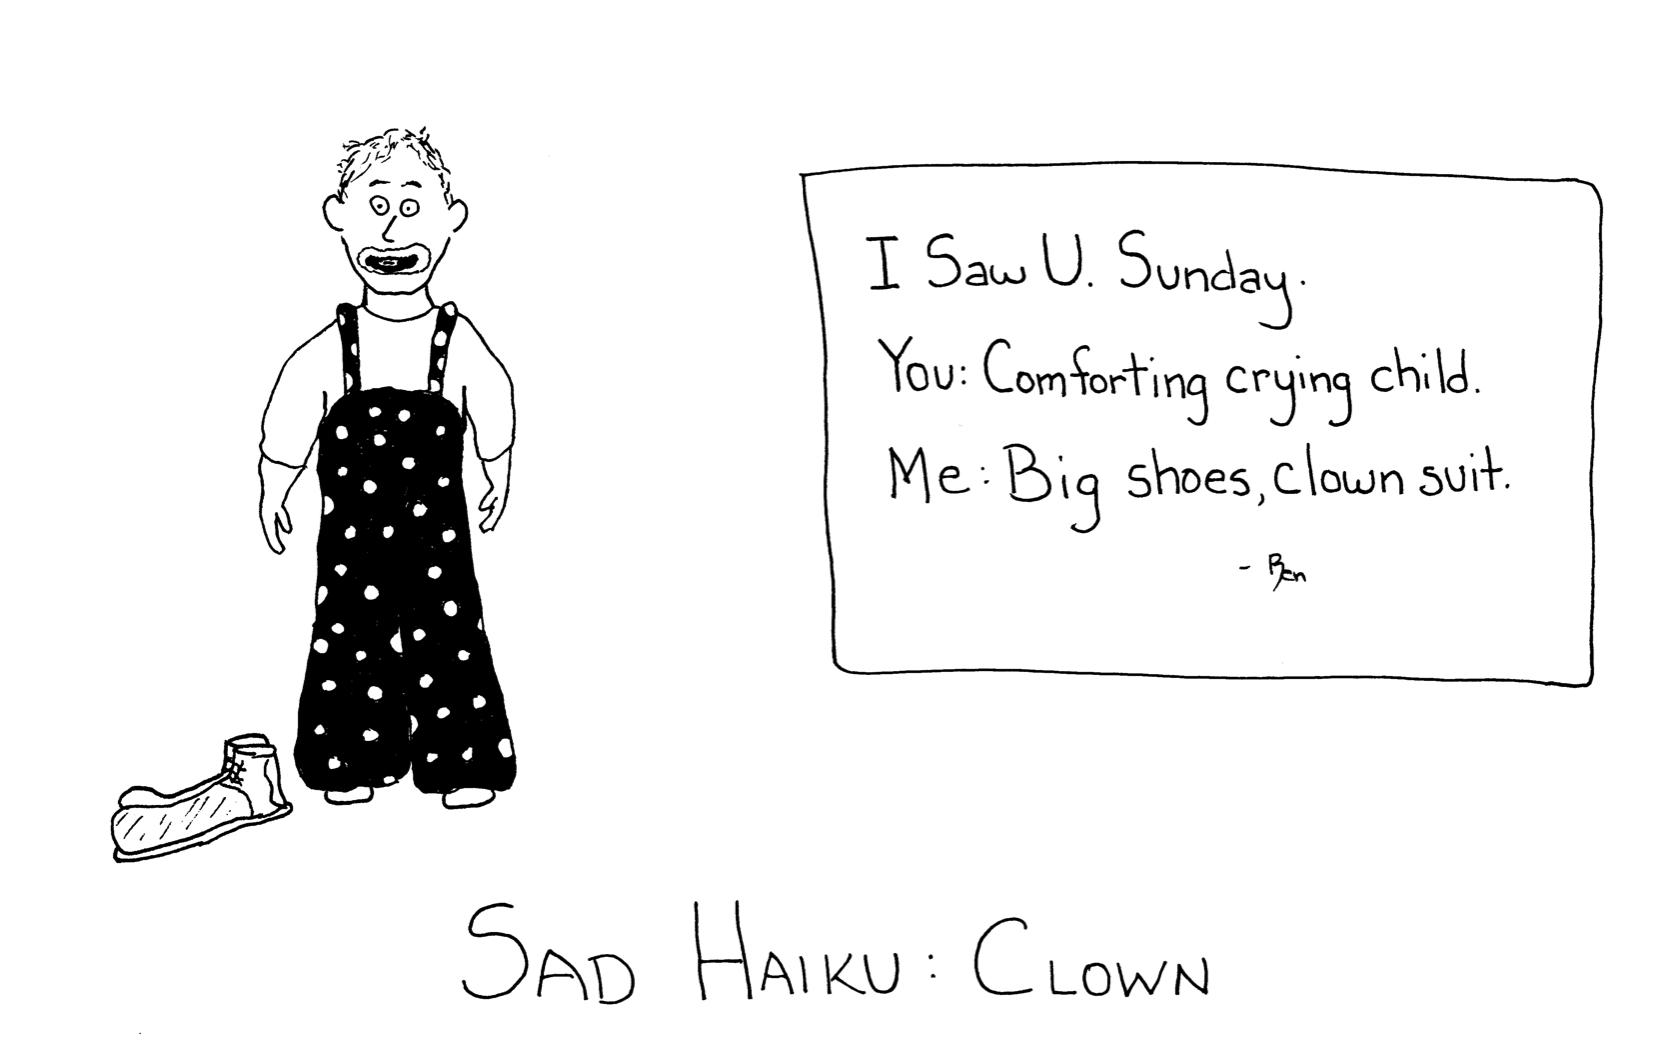 Sad Haiku- Taylor | Ted McCagg | Flickr